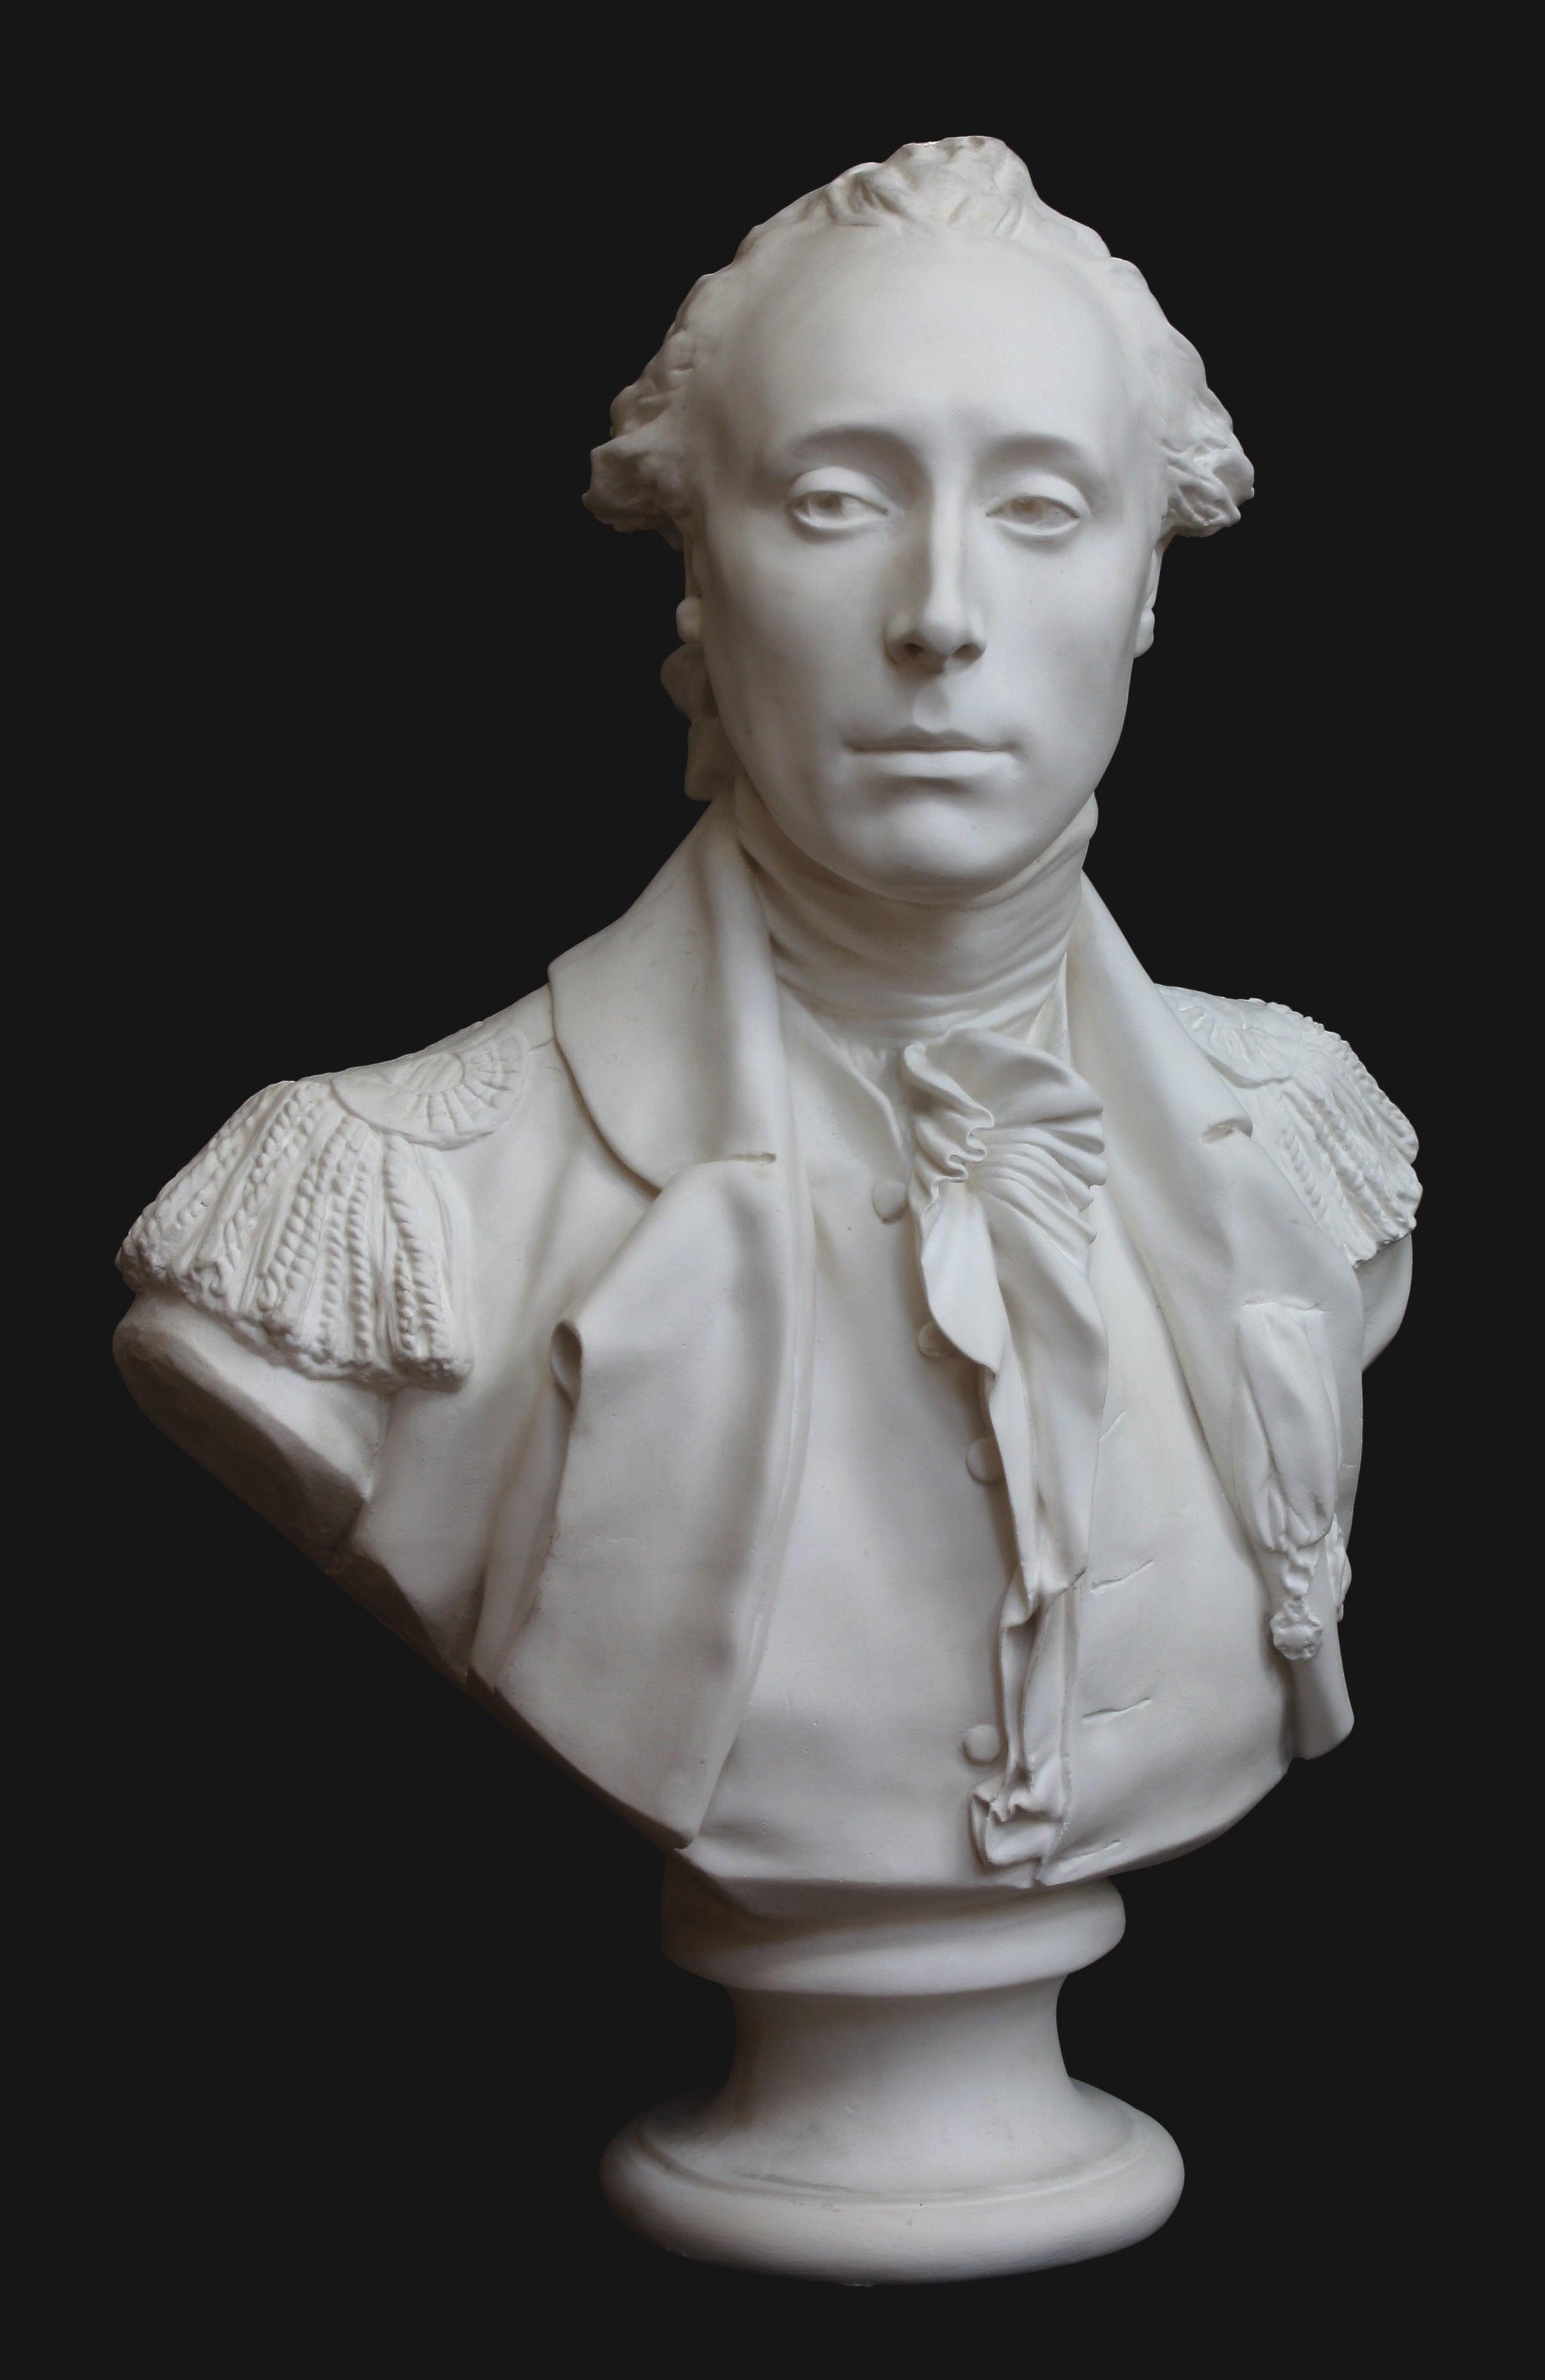 General Lafayette - Item #228